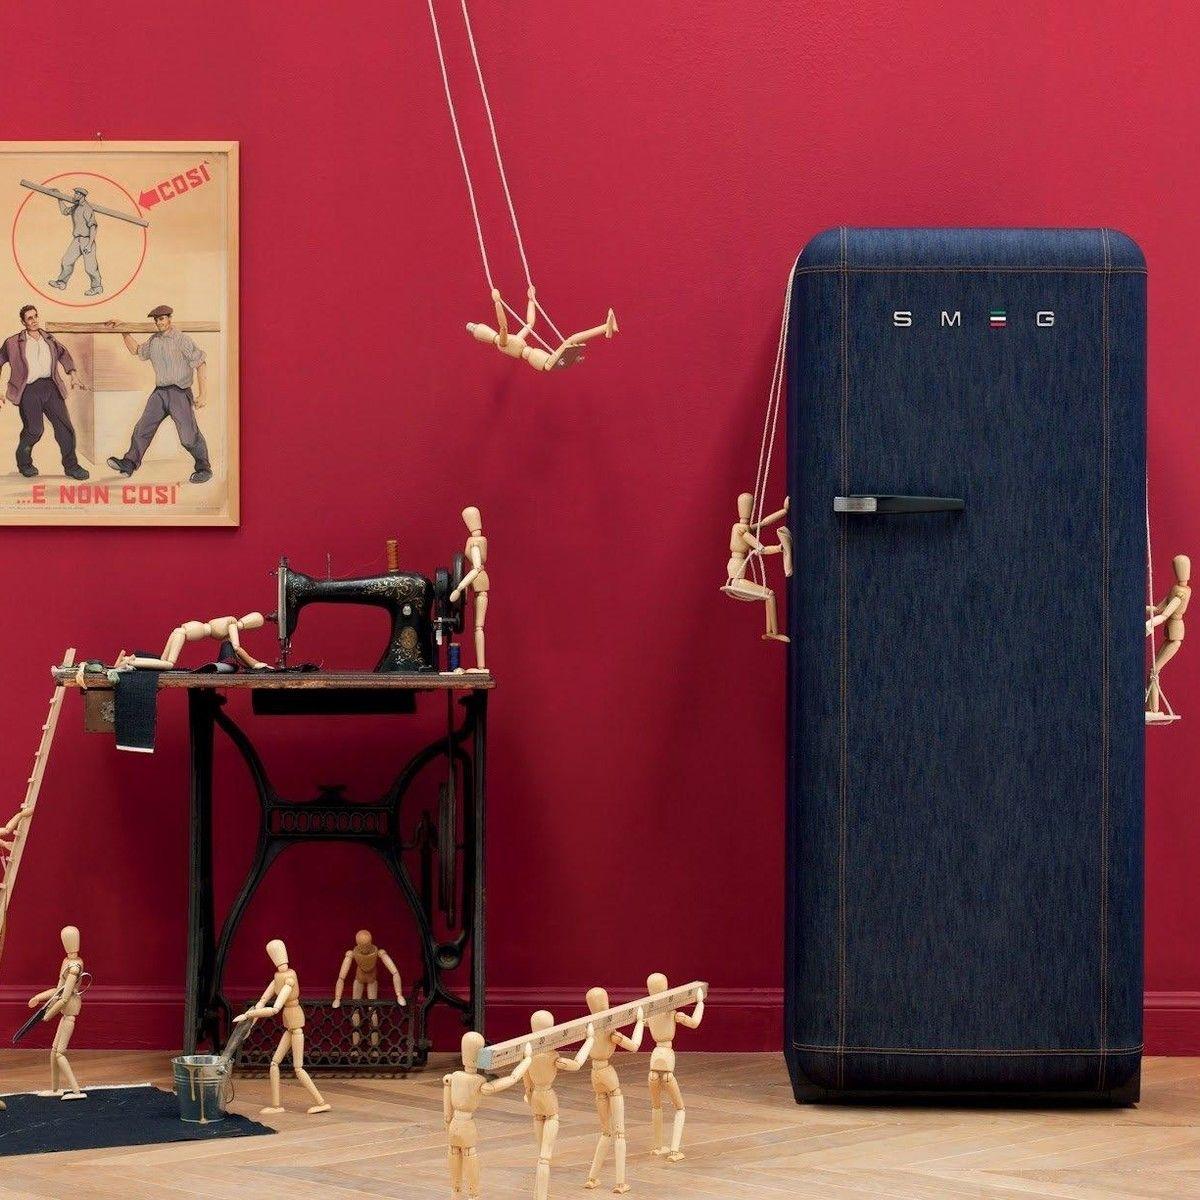 smeg fab28 jeans refrigerator smeg. Black Bedroom Furniture Sets. Home Design Ideas